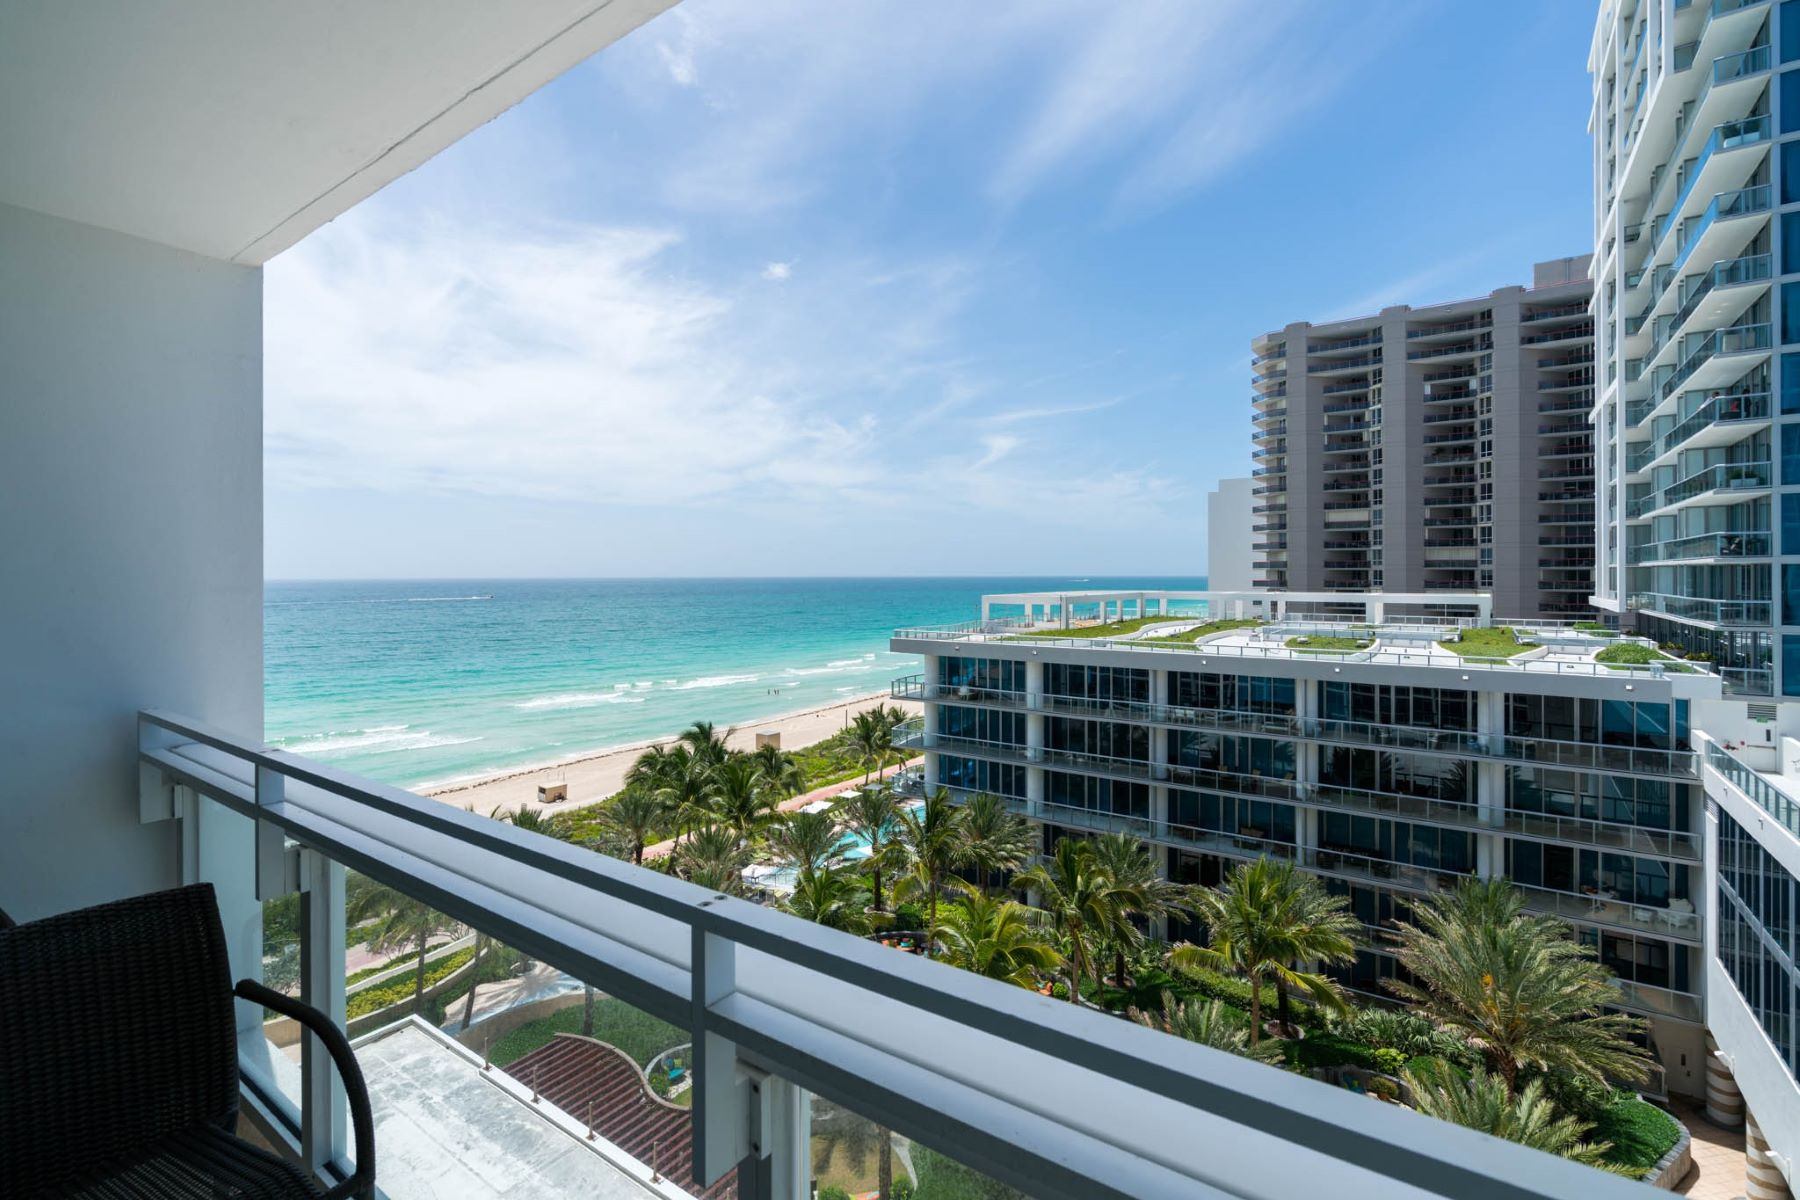 Condominium for Sale at 6801 Collins Ave #810 6801 Collins Ave 810 Miami Beach, Florida, 33141 United States